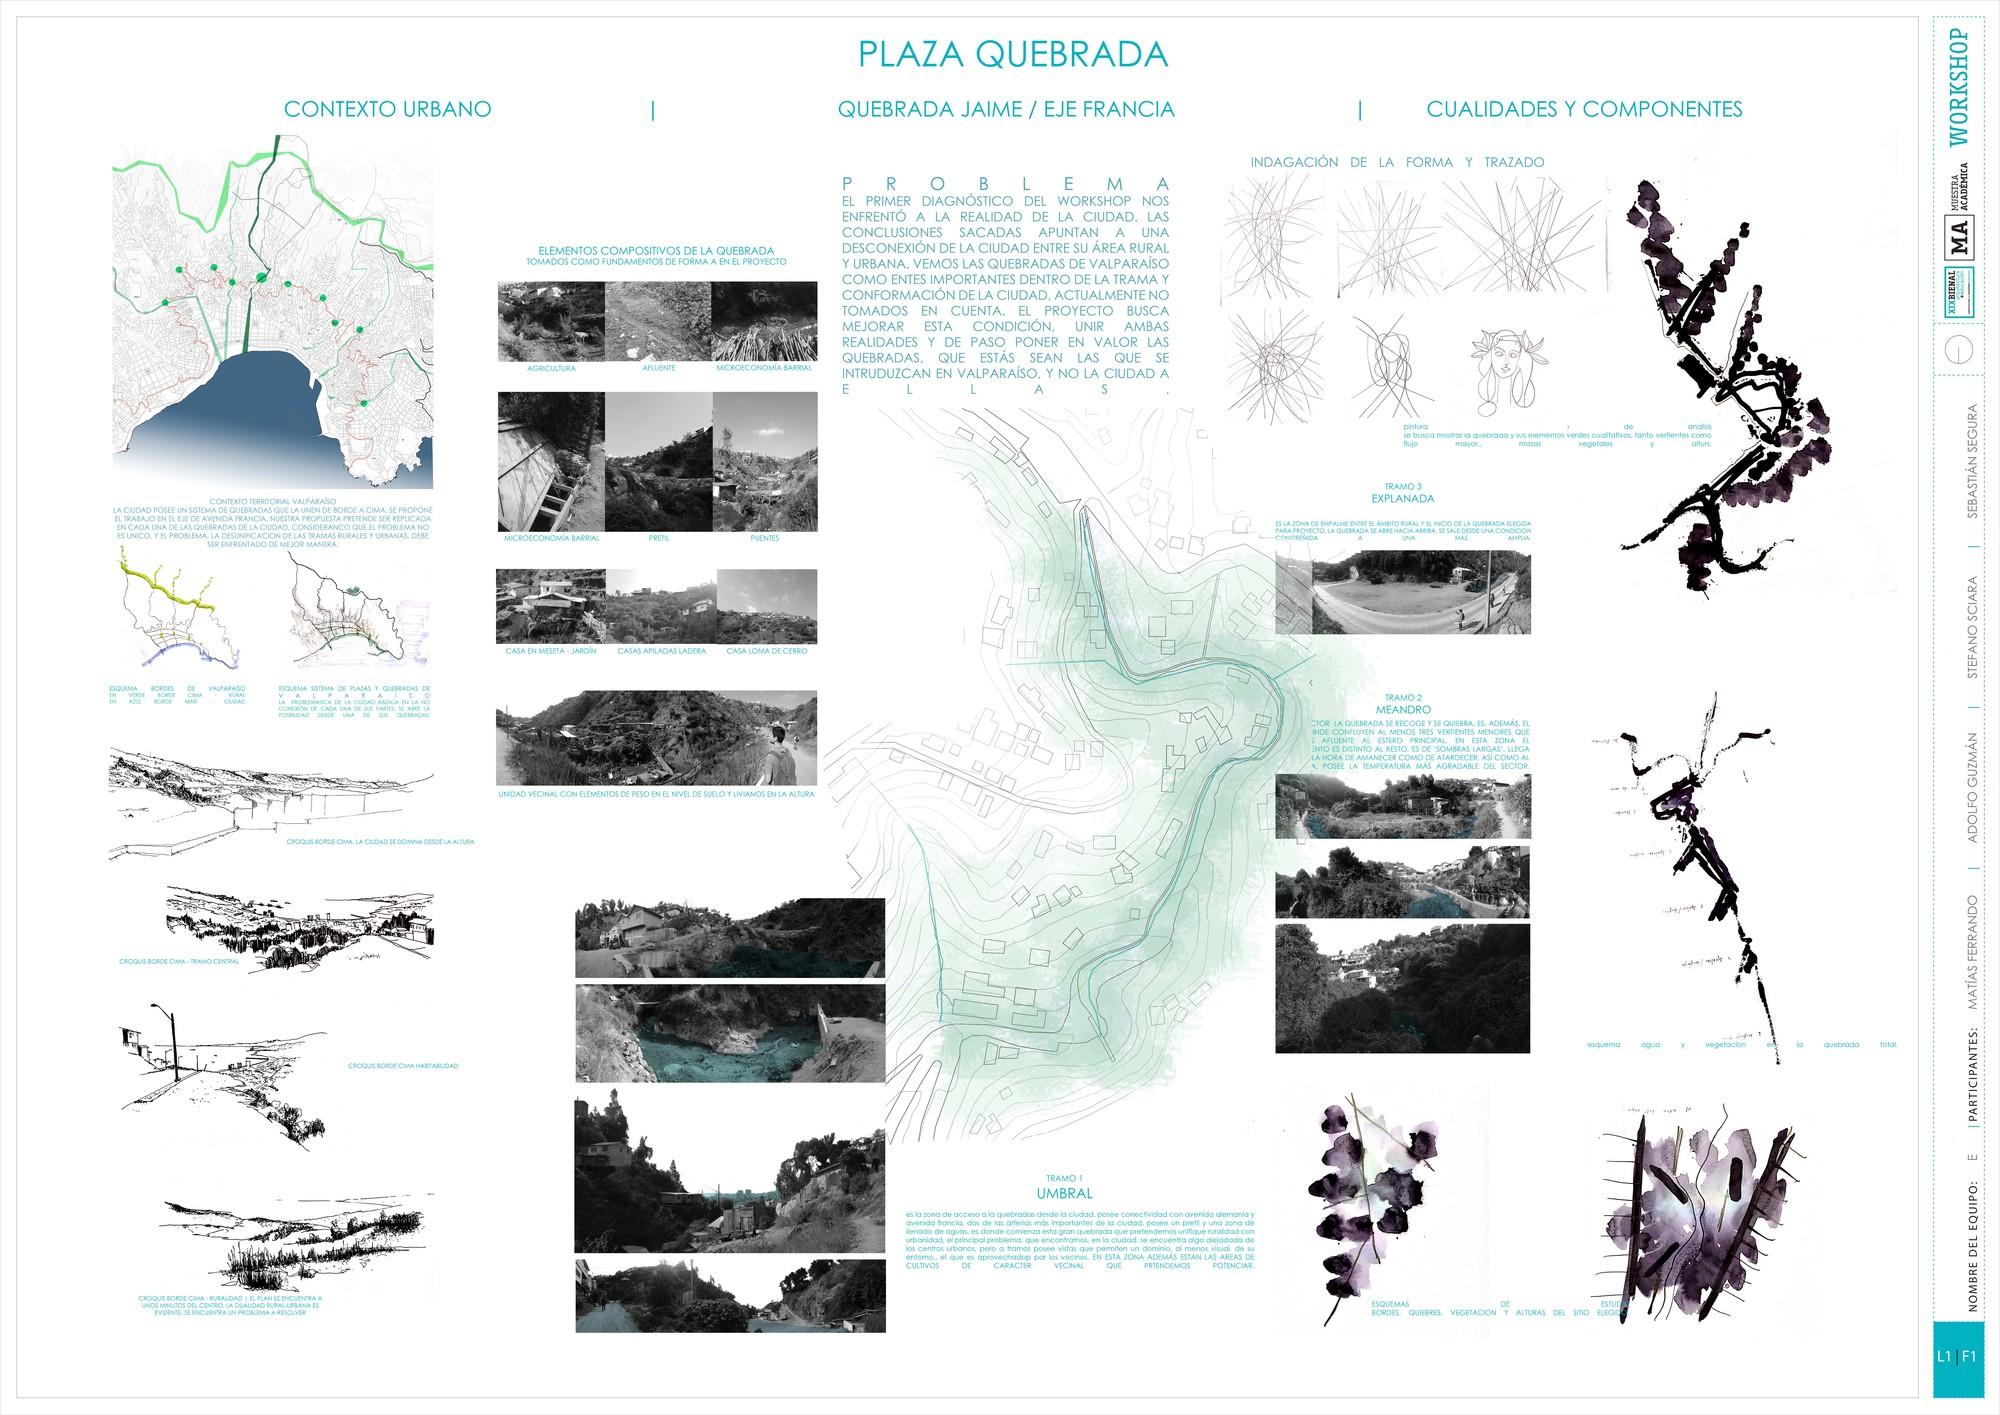 Primer Lugar: Lámina #01. Image Cortesia de Equipo XIX Bienal